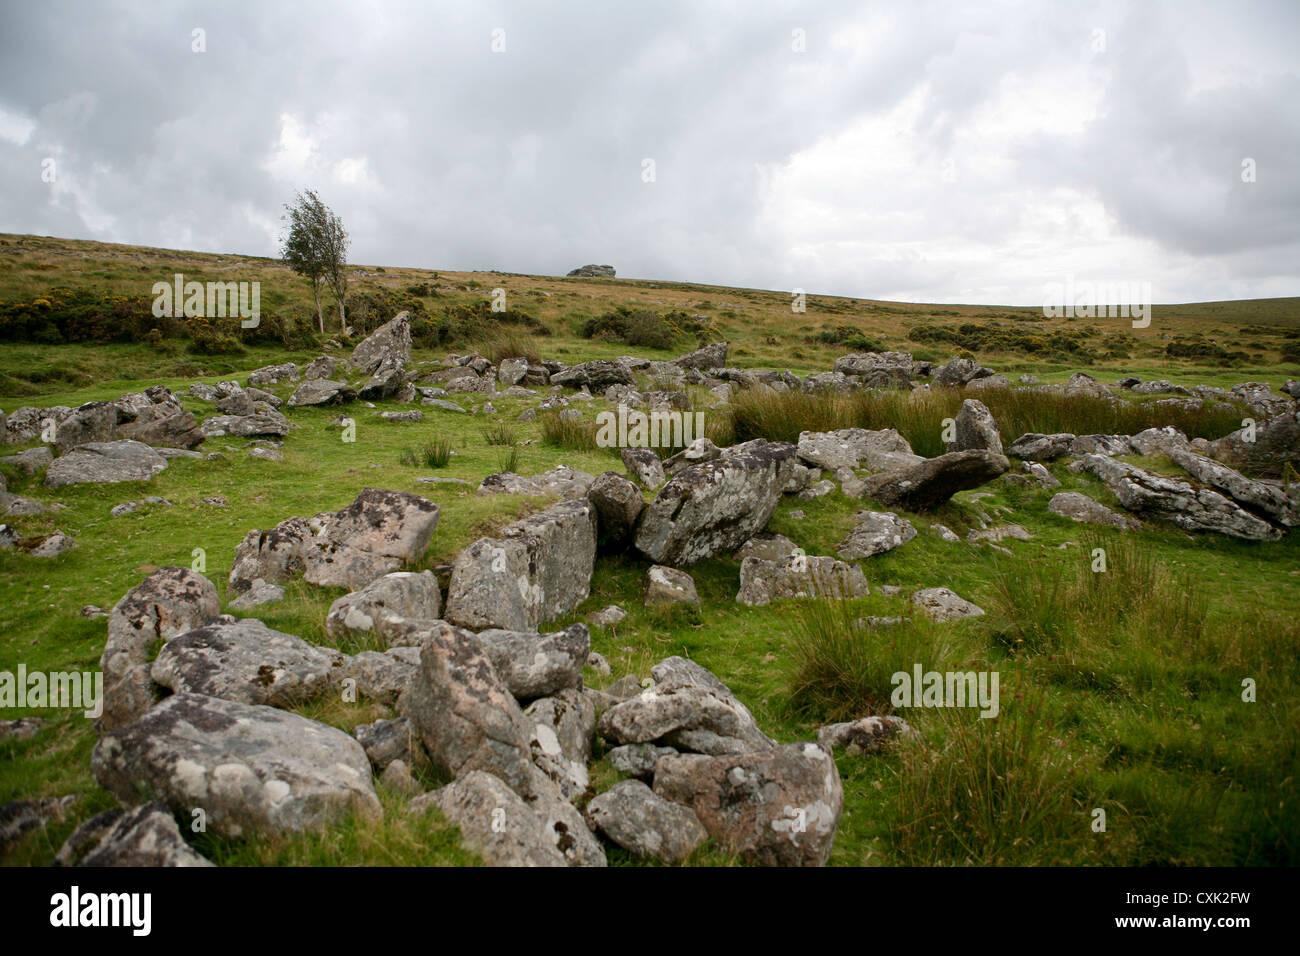 Large ancient hut circle, granite stone walls, with Kestor Rock on the horizon, Dartmoor National Park, Devon, UK - Stock Image